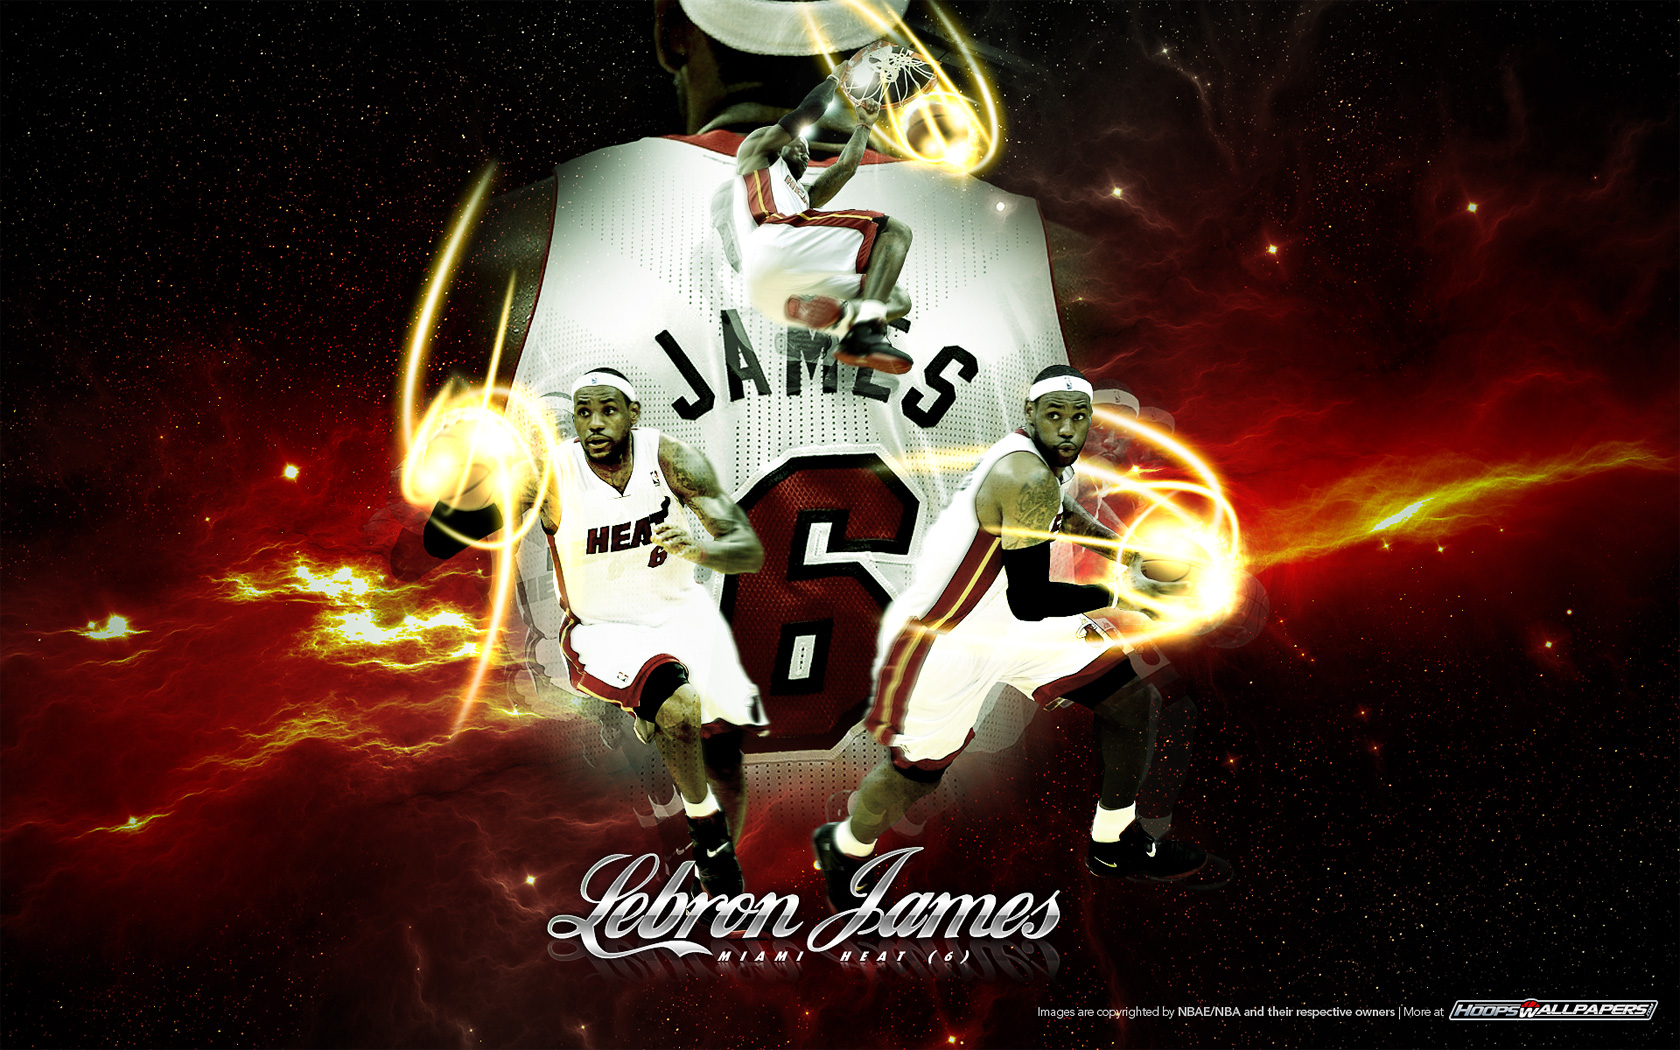 NBA and basketball wallpapers for download LeBron James 1680x1050